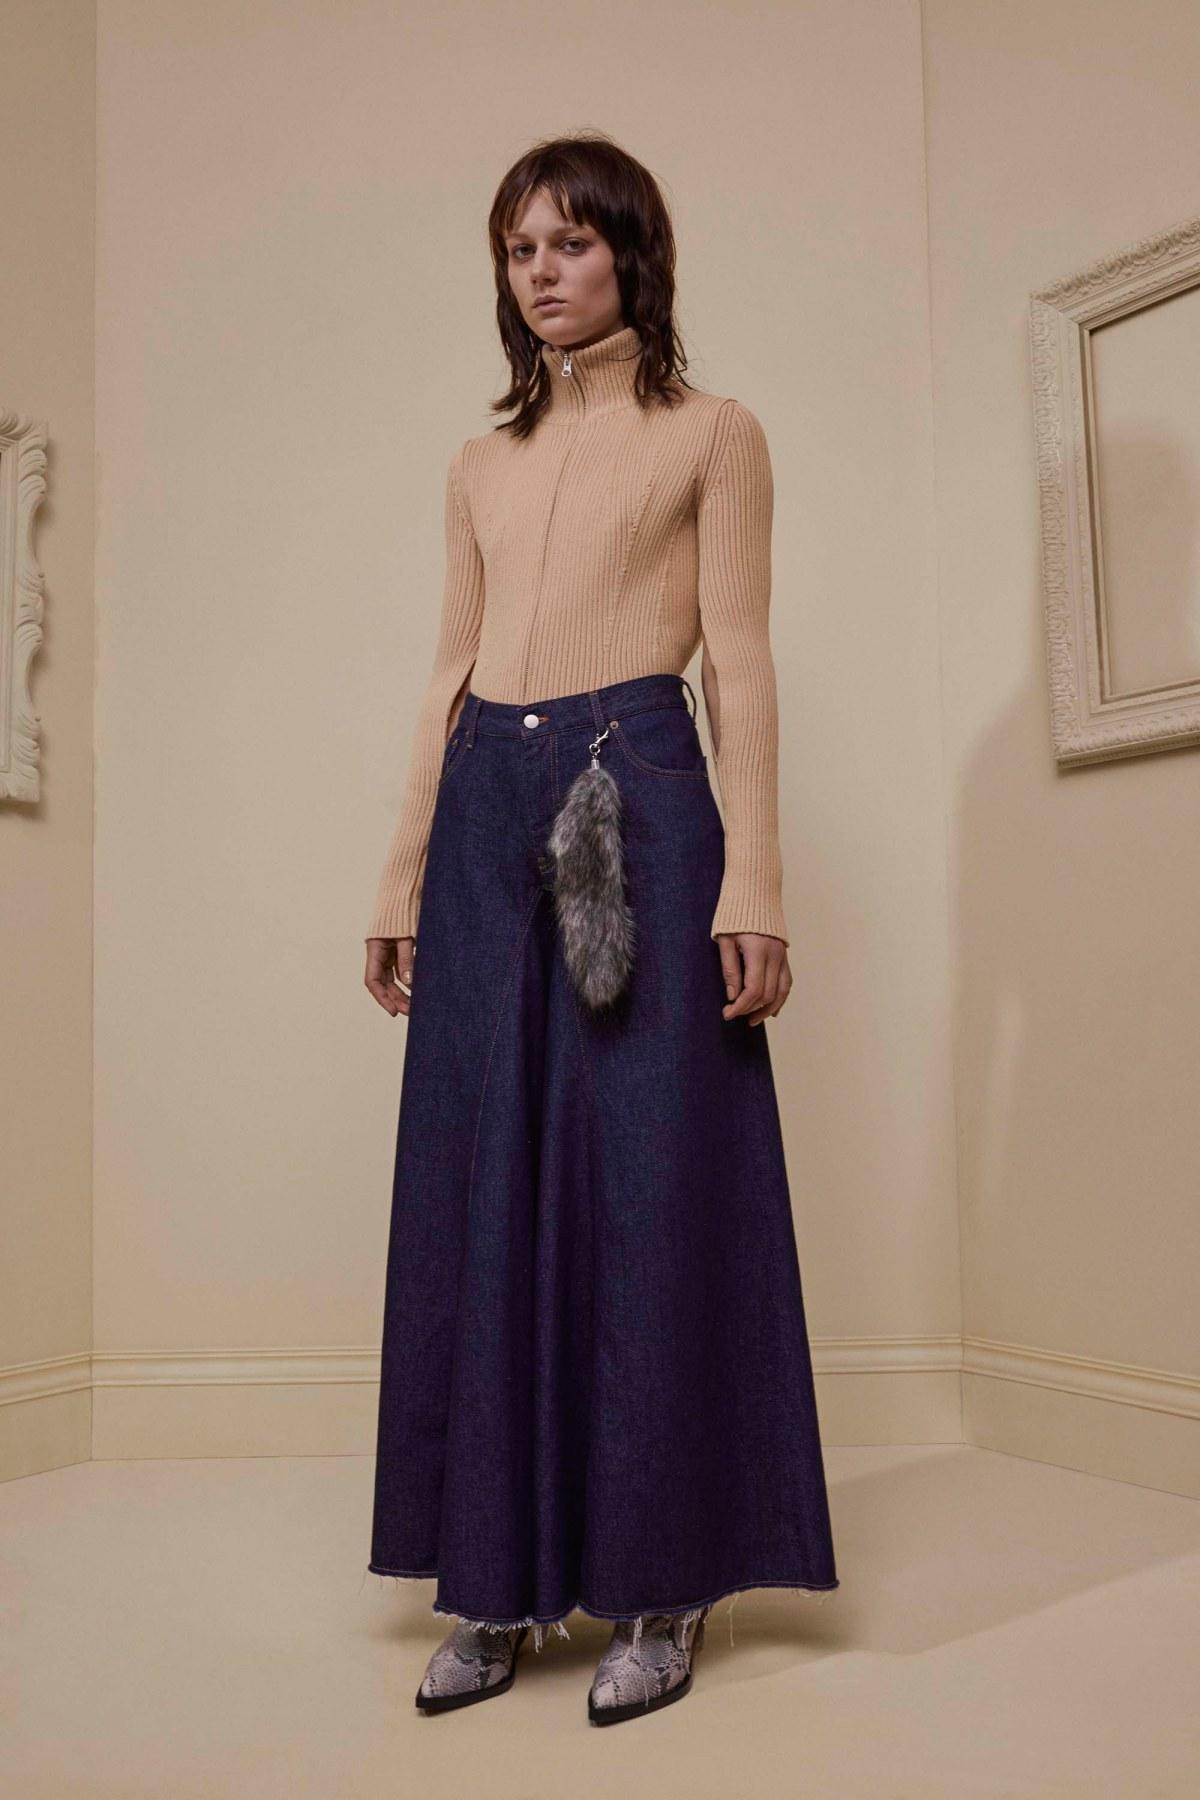 mm6-maison-margiela-pre-fall-2017-fashion-show-the-impression-02